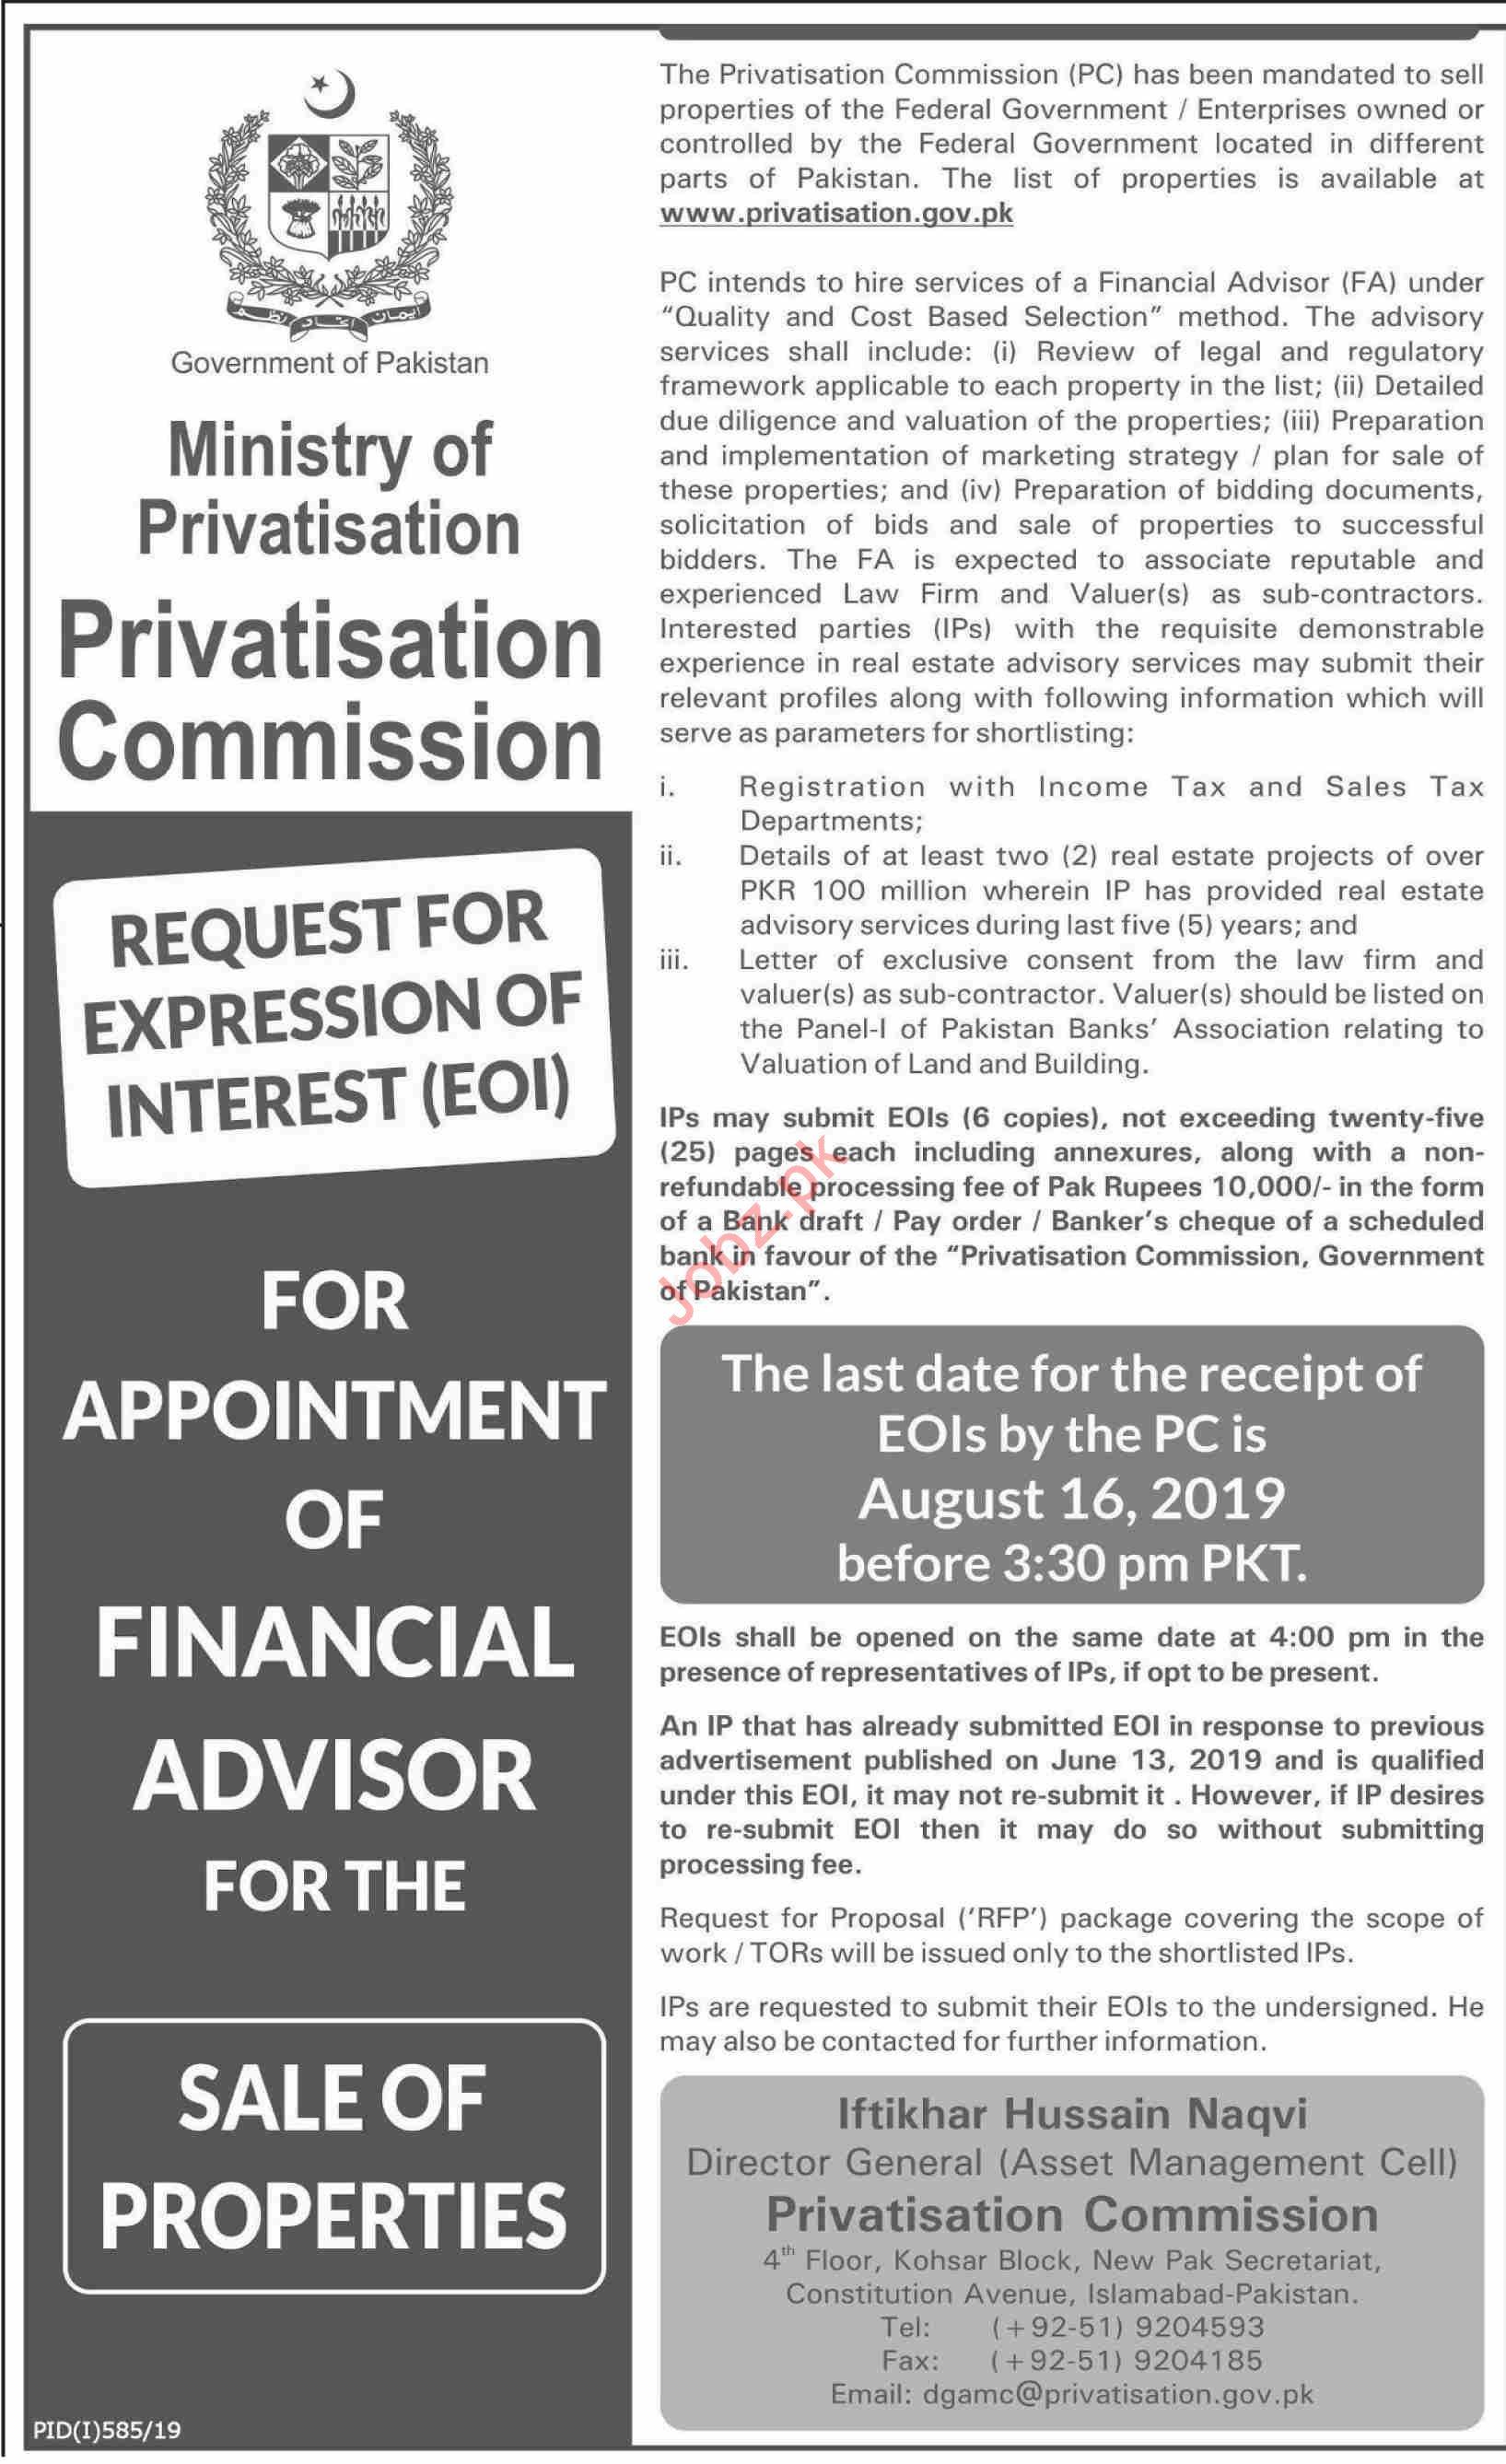 Privatisation Commissions Islamabad Jobs Financial Advisor